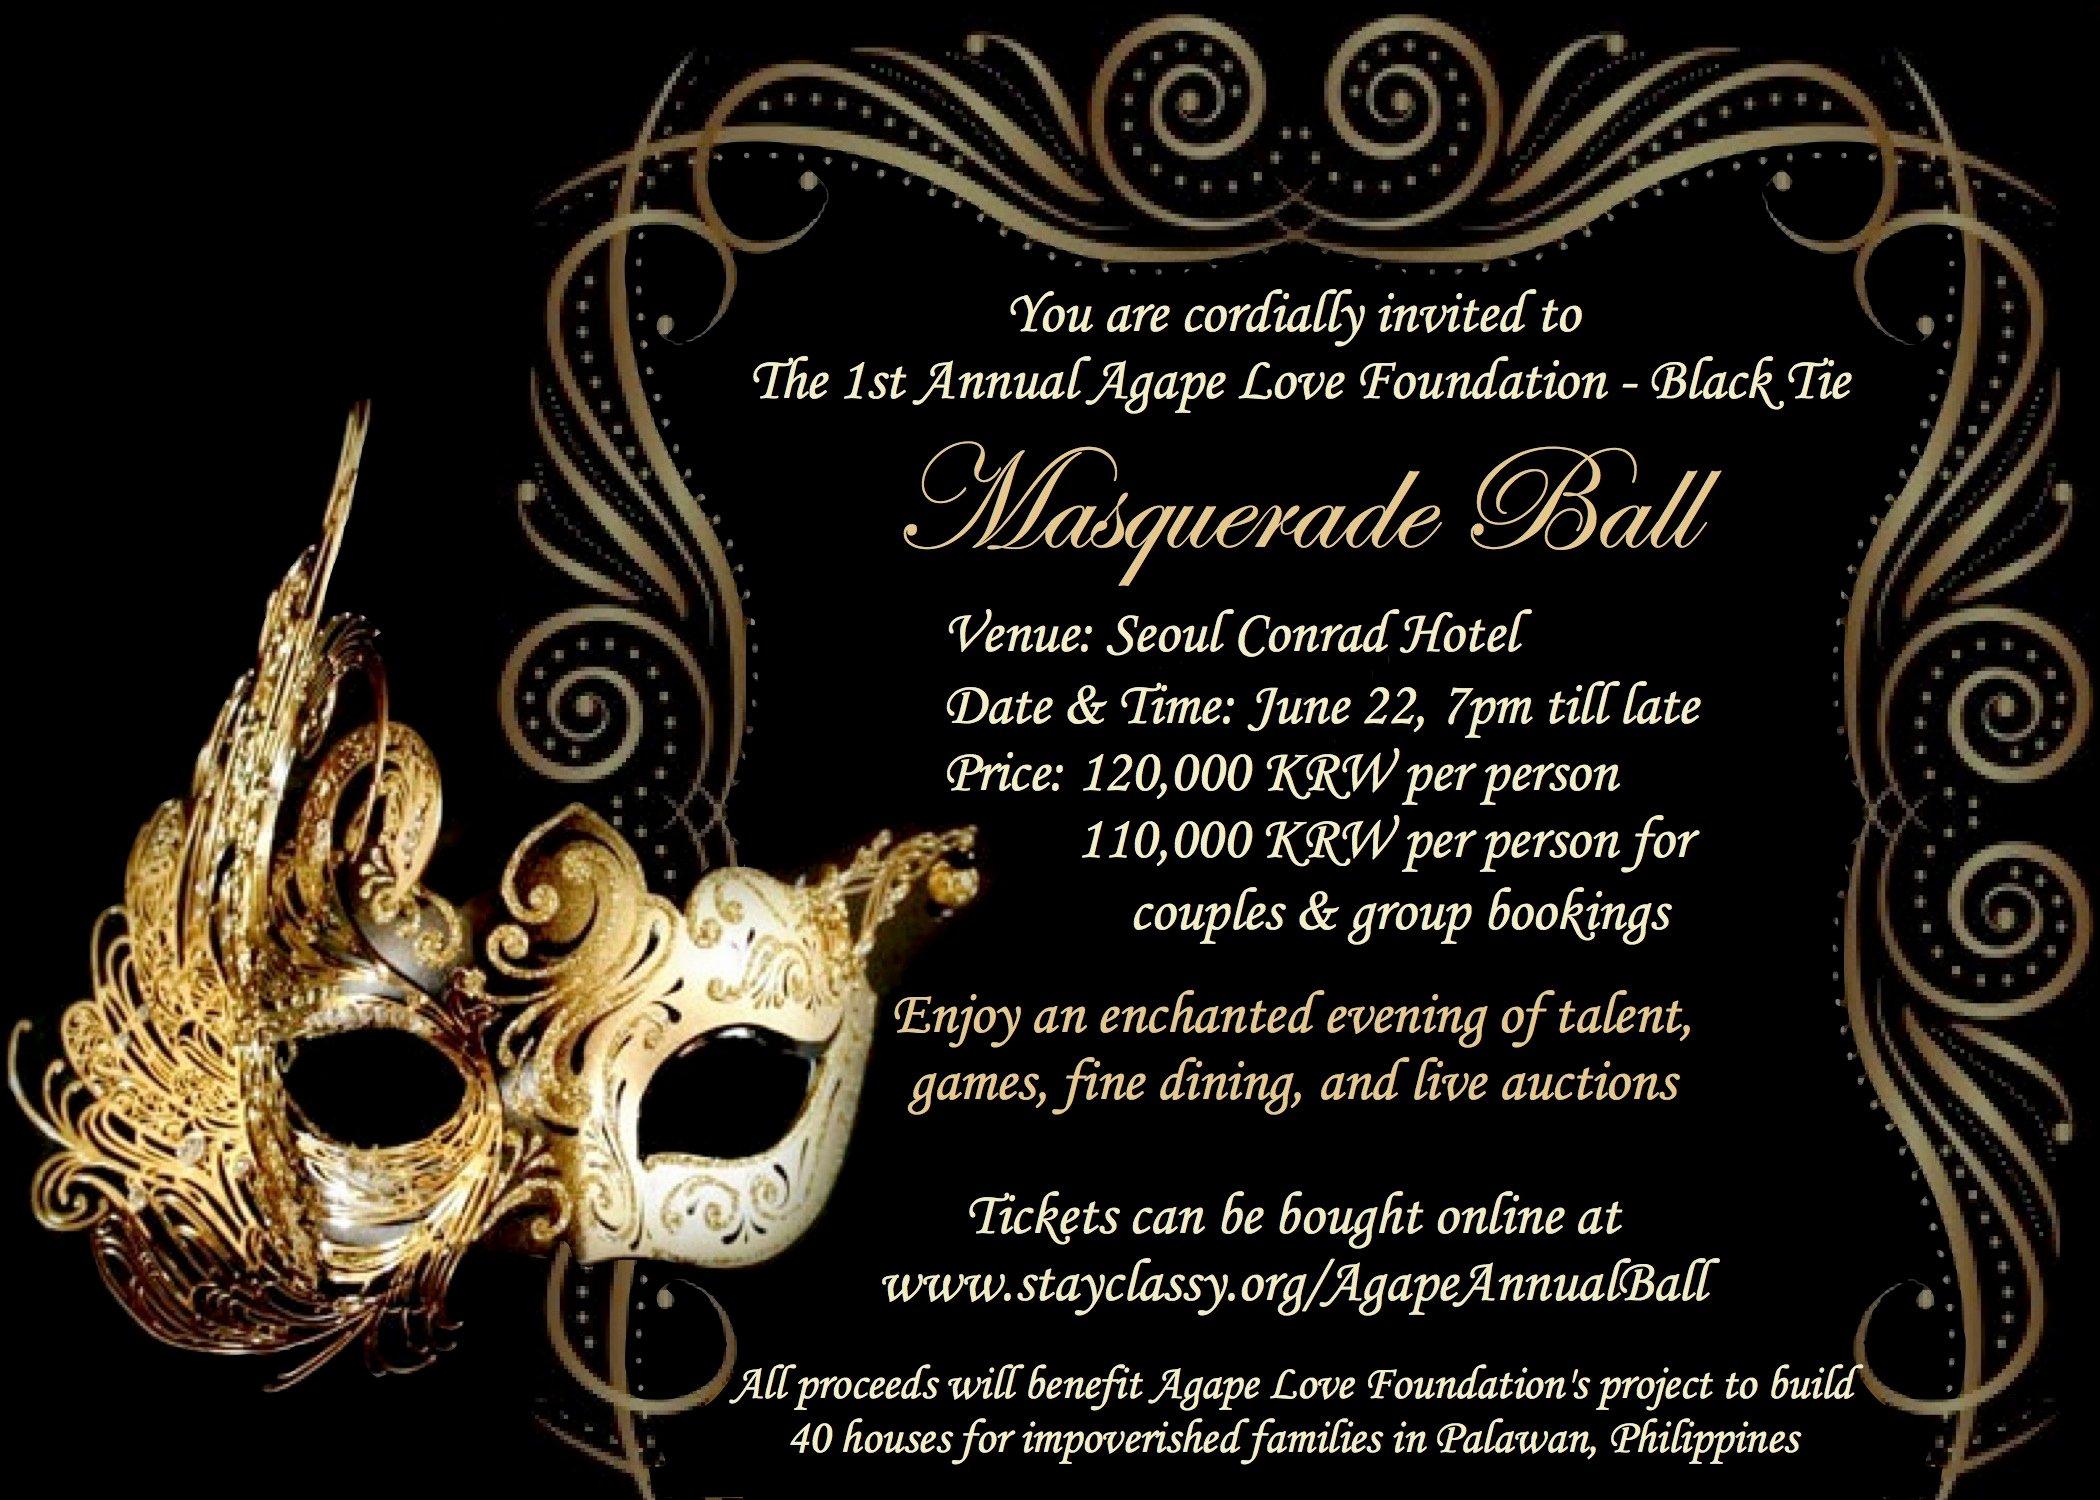 Masquerade Invitations Templates Free Beautiful Birthday Party Invitations Free Templates Free Invitation Templates Drevio